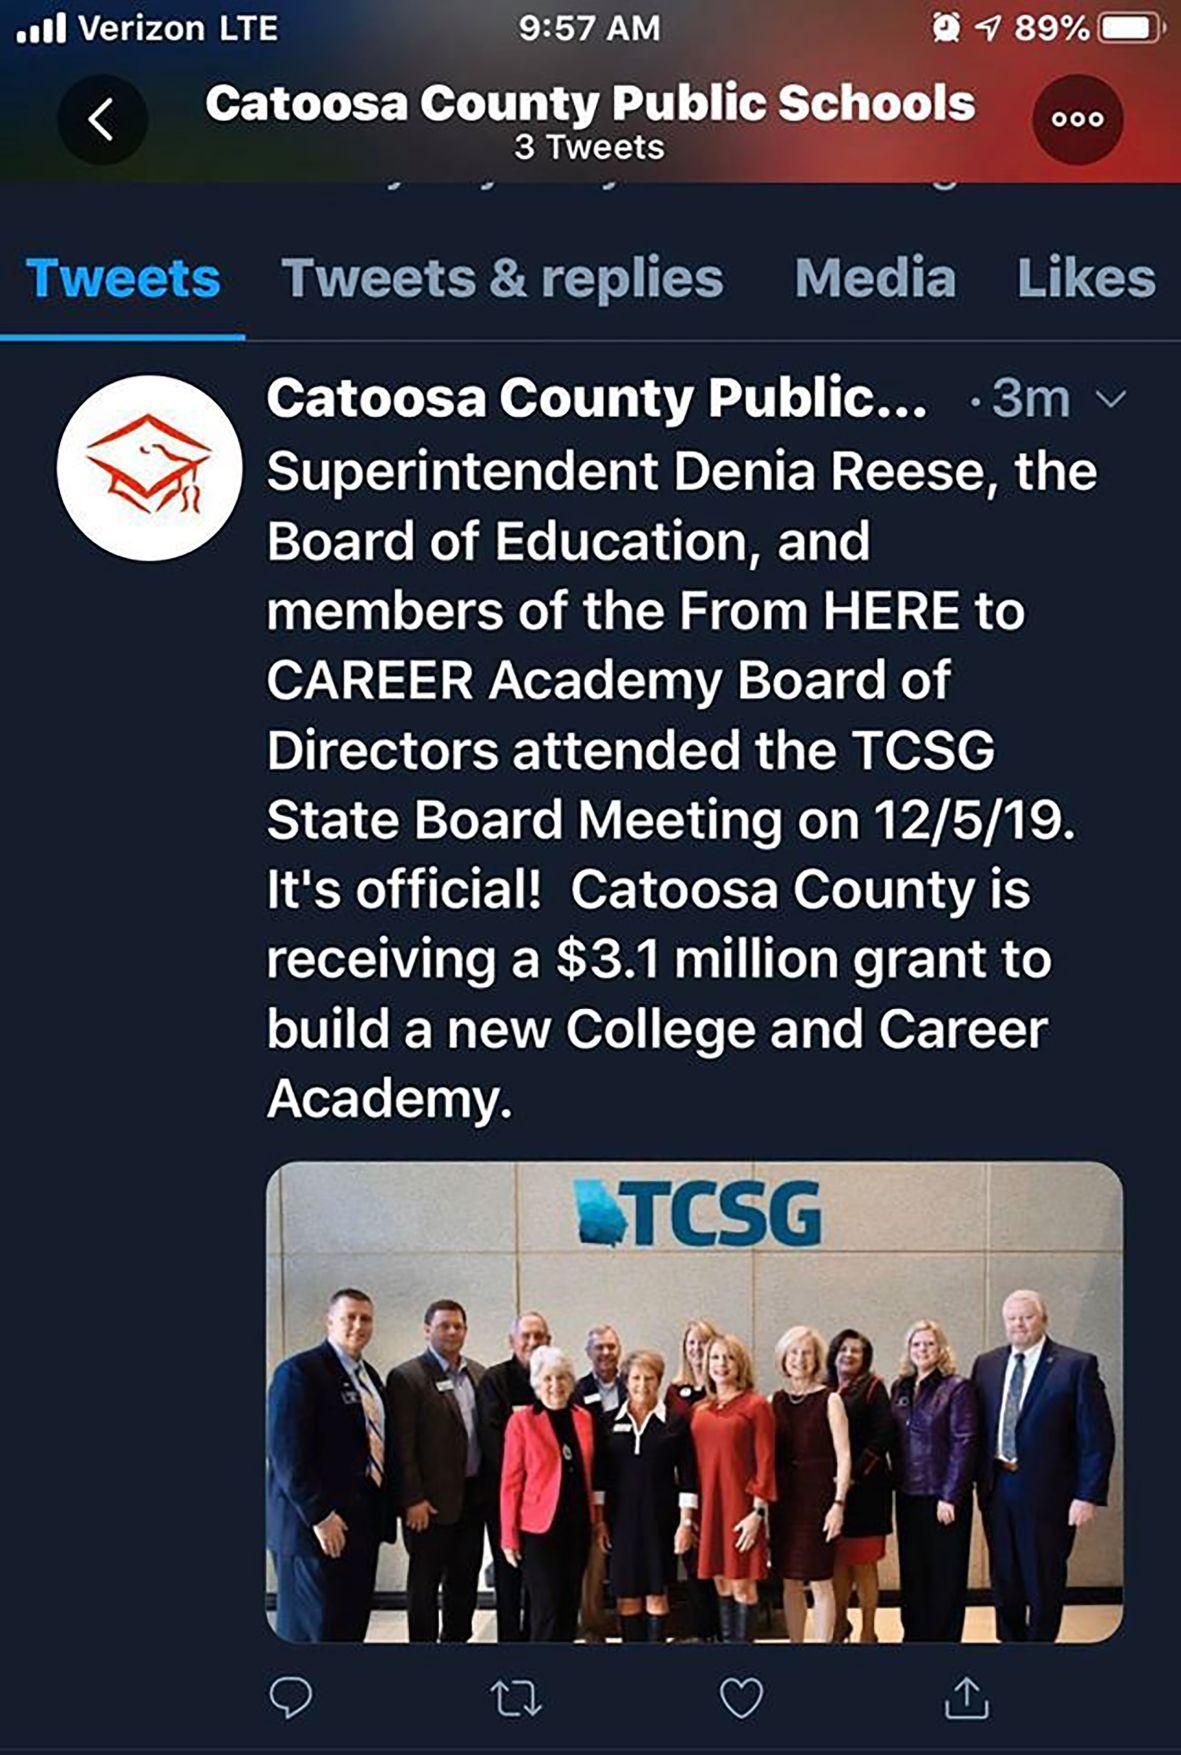 Tweet, Catoosa Schools gets $3 million grant for college/career academy